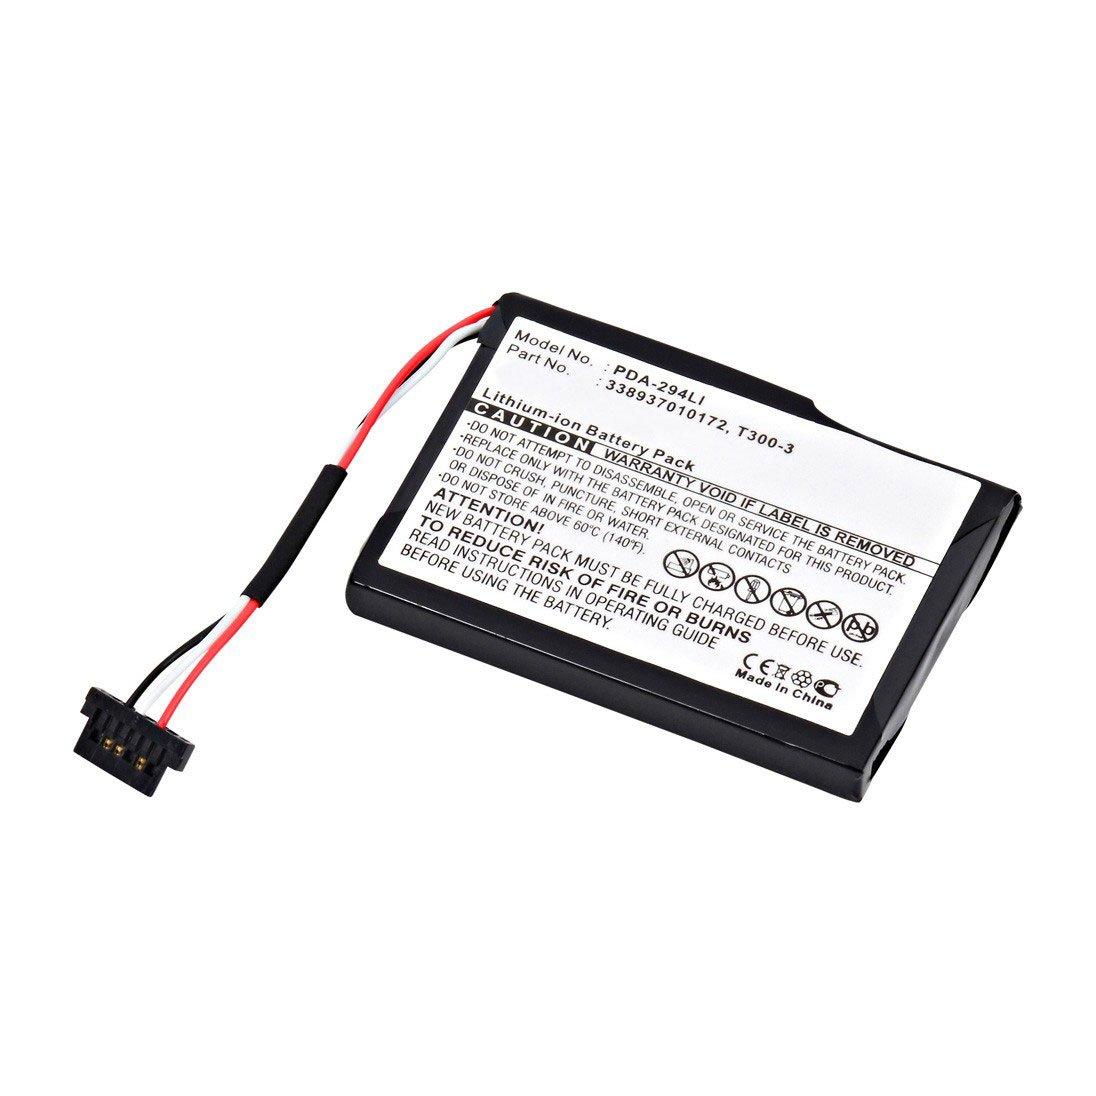 Replacement Mio Moov 400 Battery: BatteryMart.com